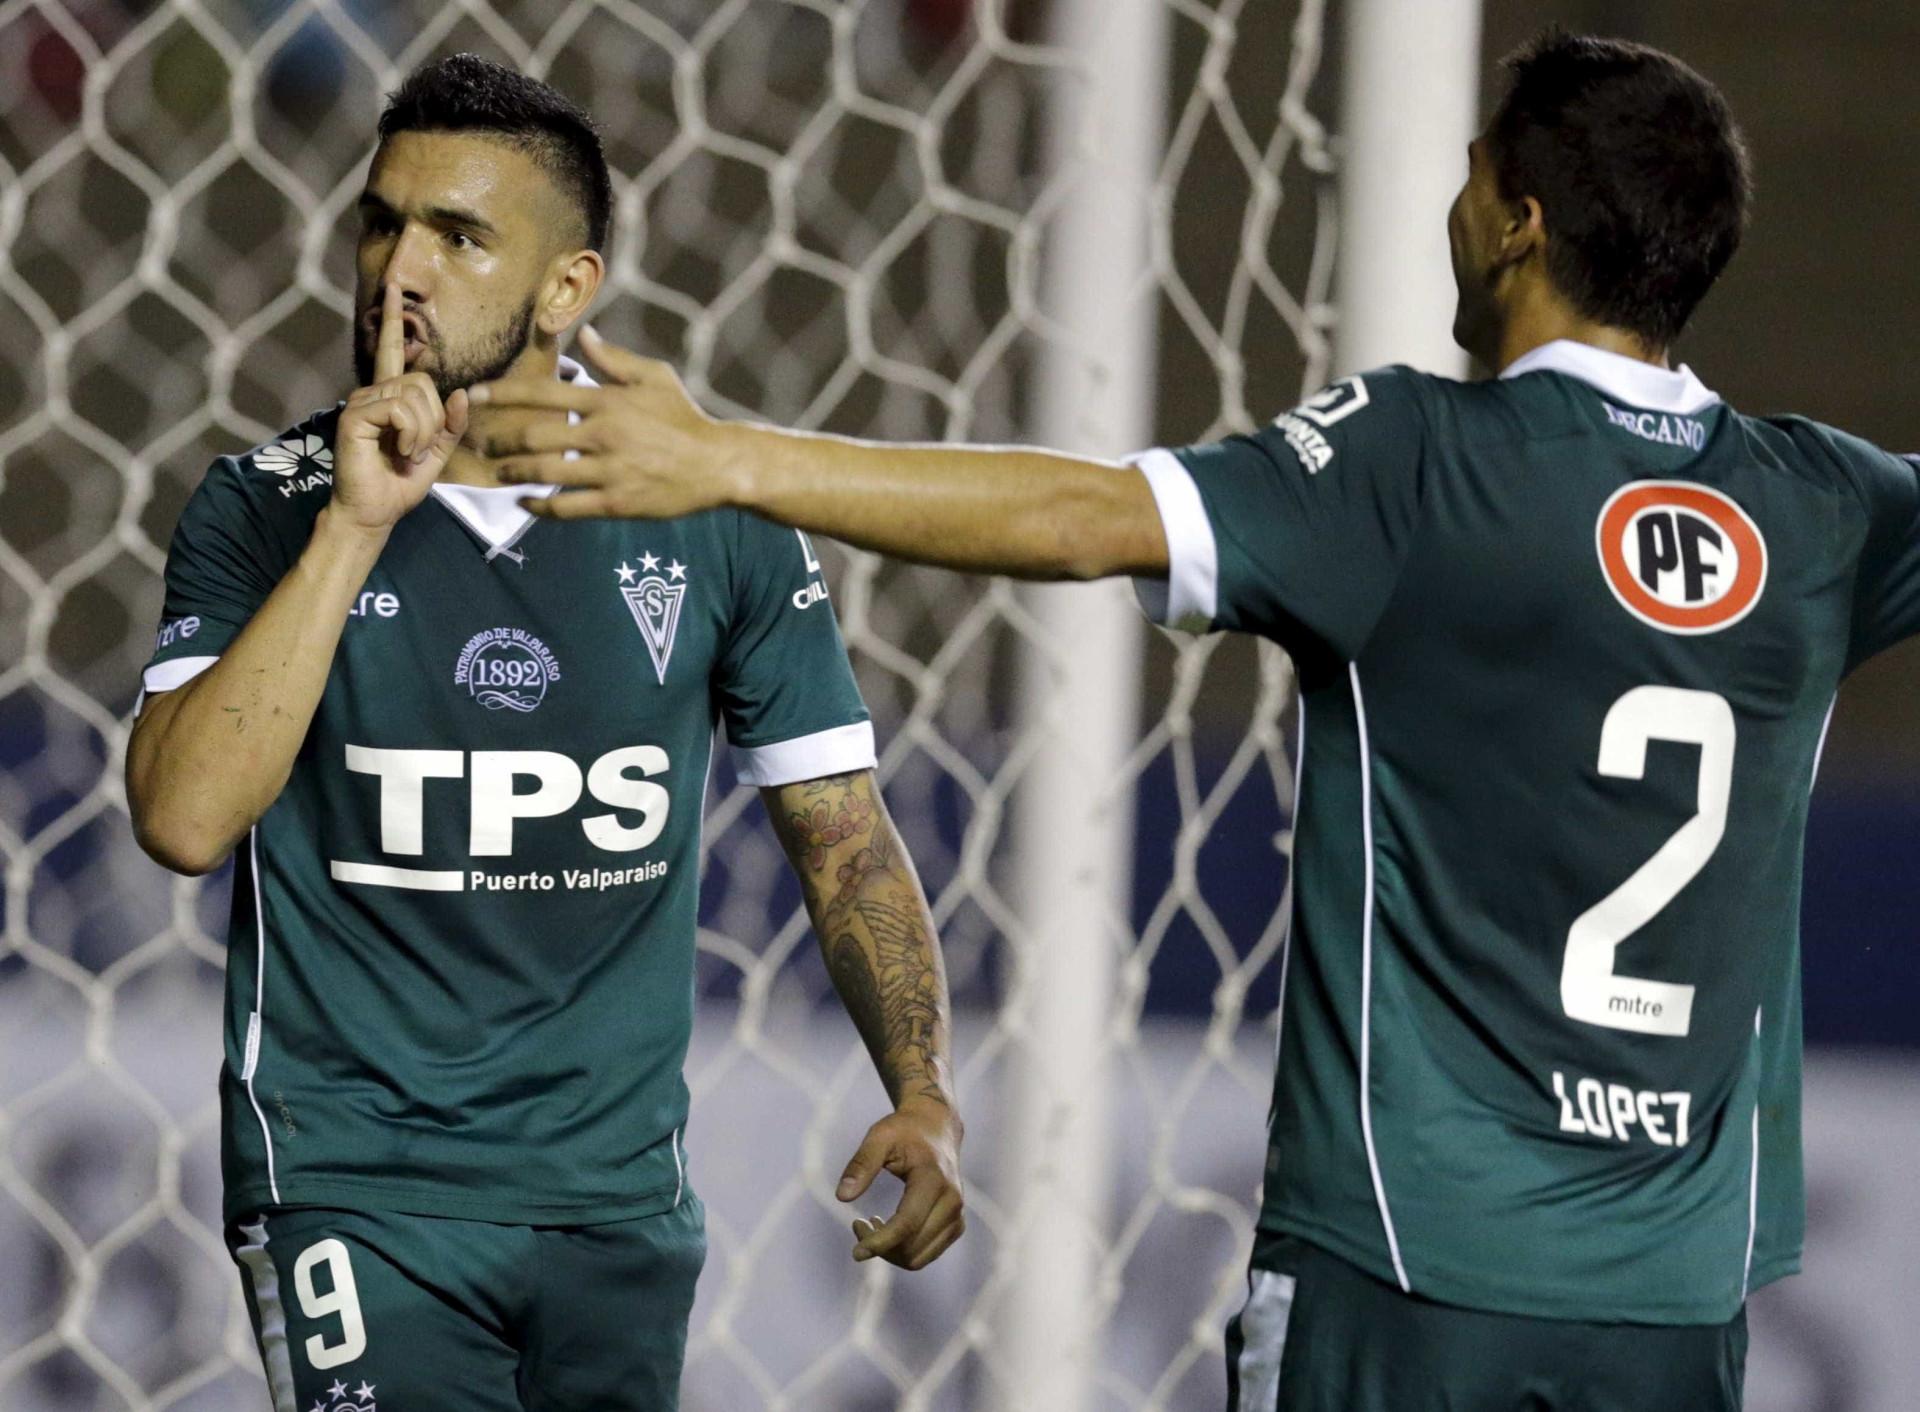 Conheça os 38 times classificados para a Libertadores de 2018